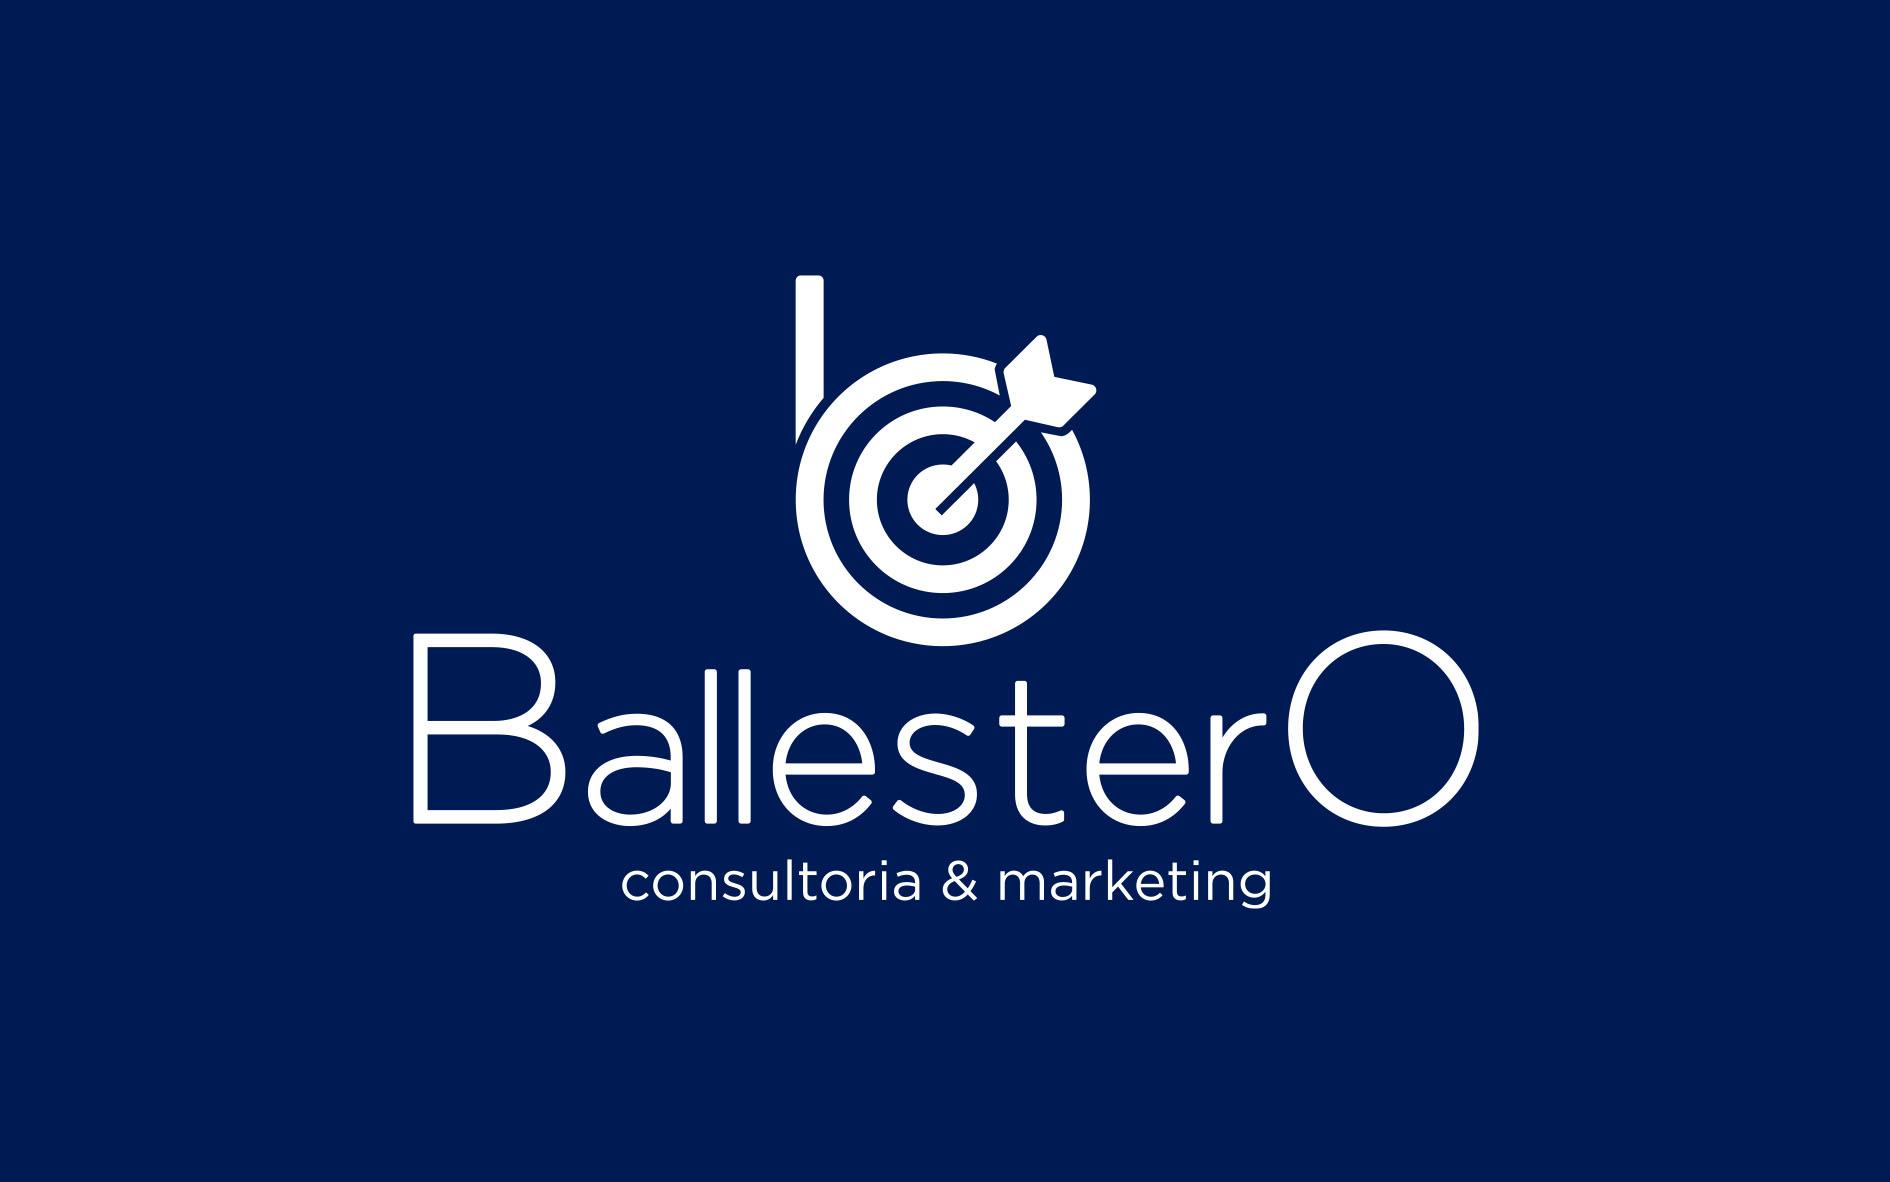 ballestero-03c-behance